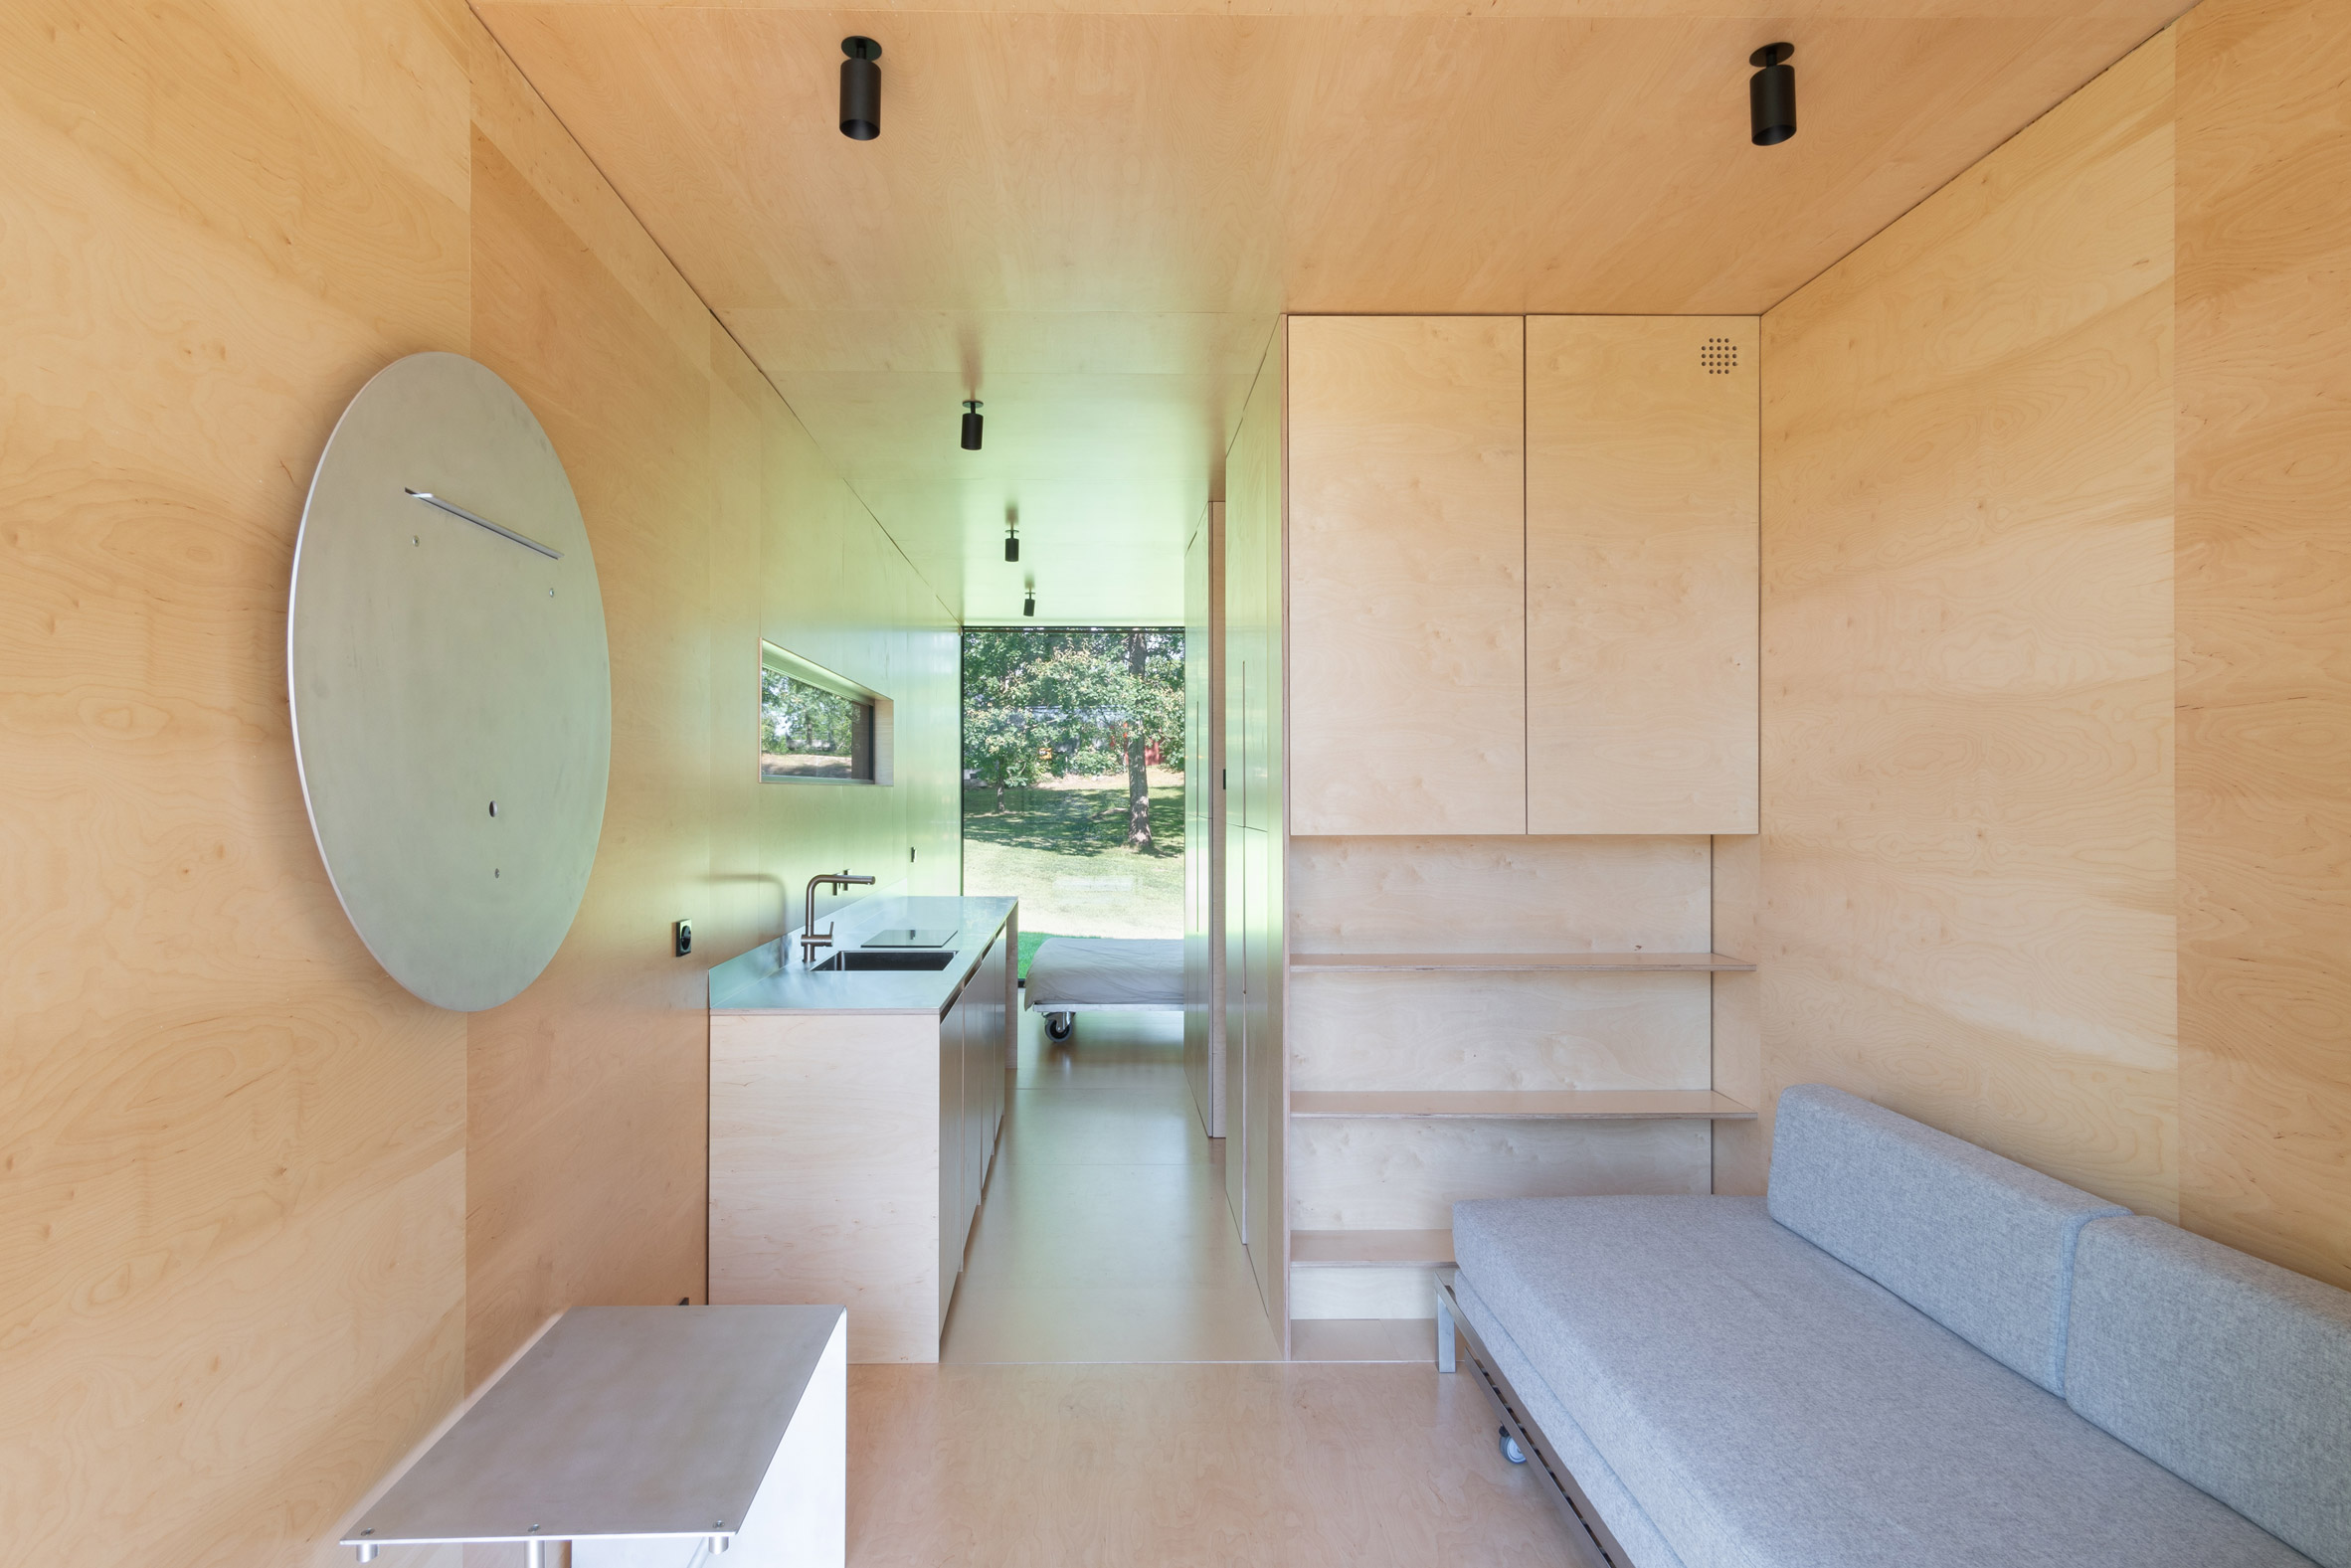 Plywood interior of 019 Cabin by ŠA Atelier and Piritas